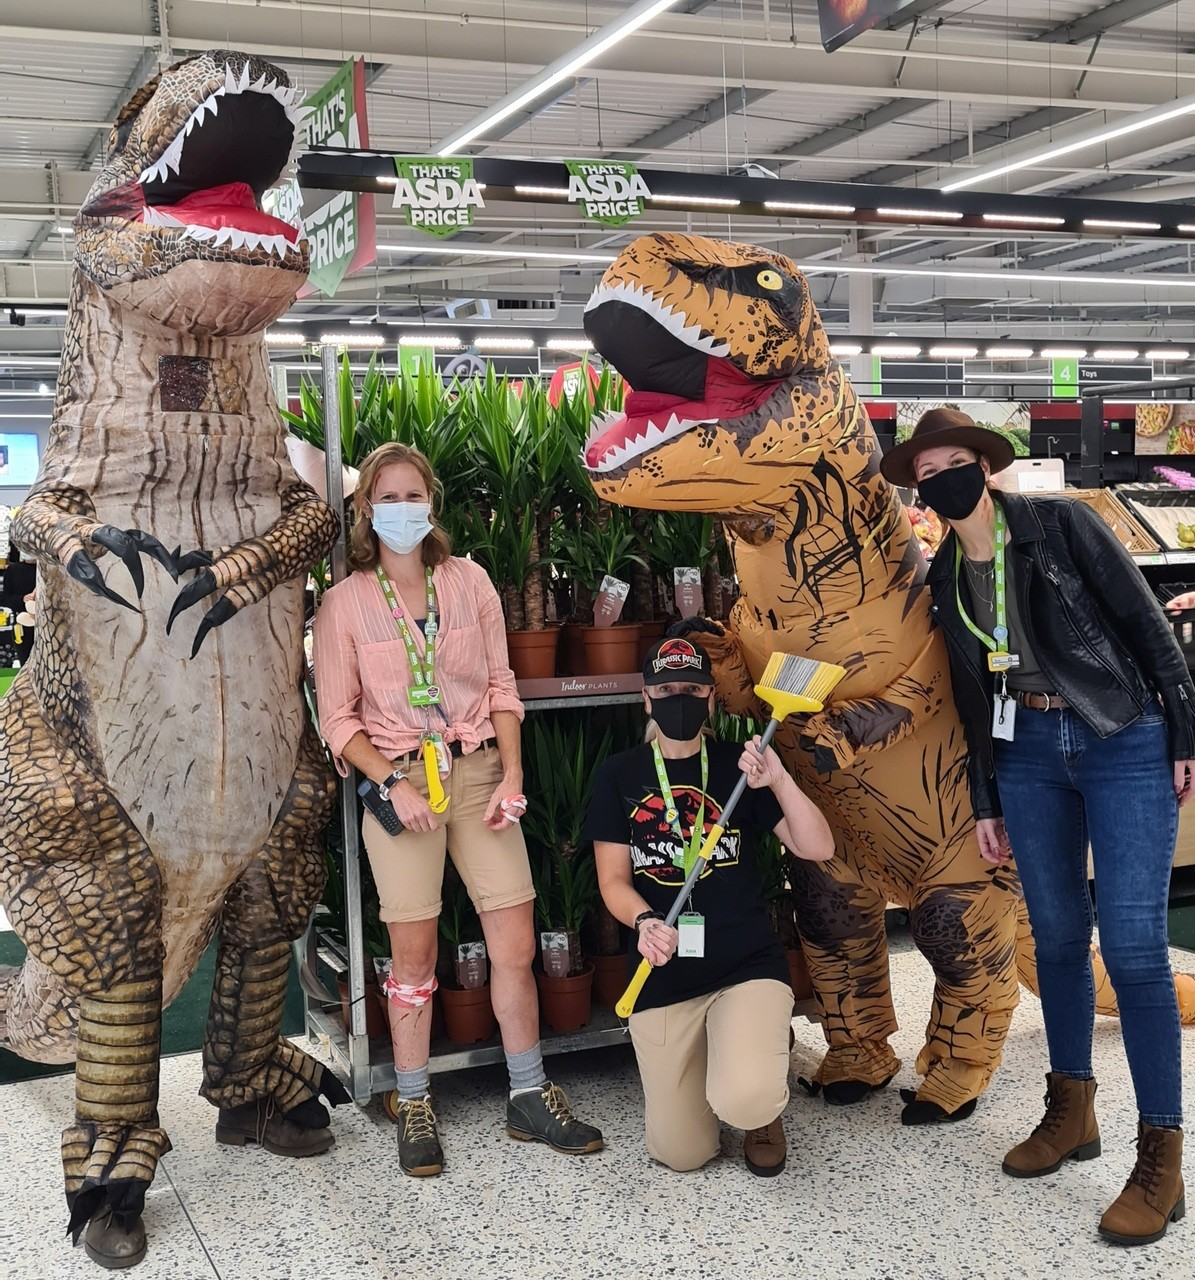 Jurassic Asda | Asda Newport Isle of Wight